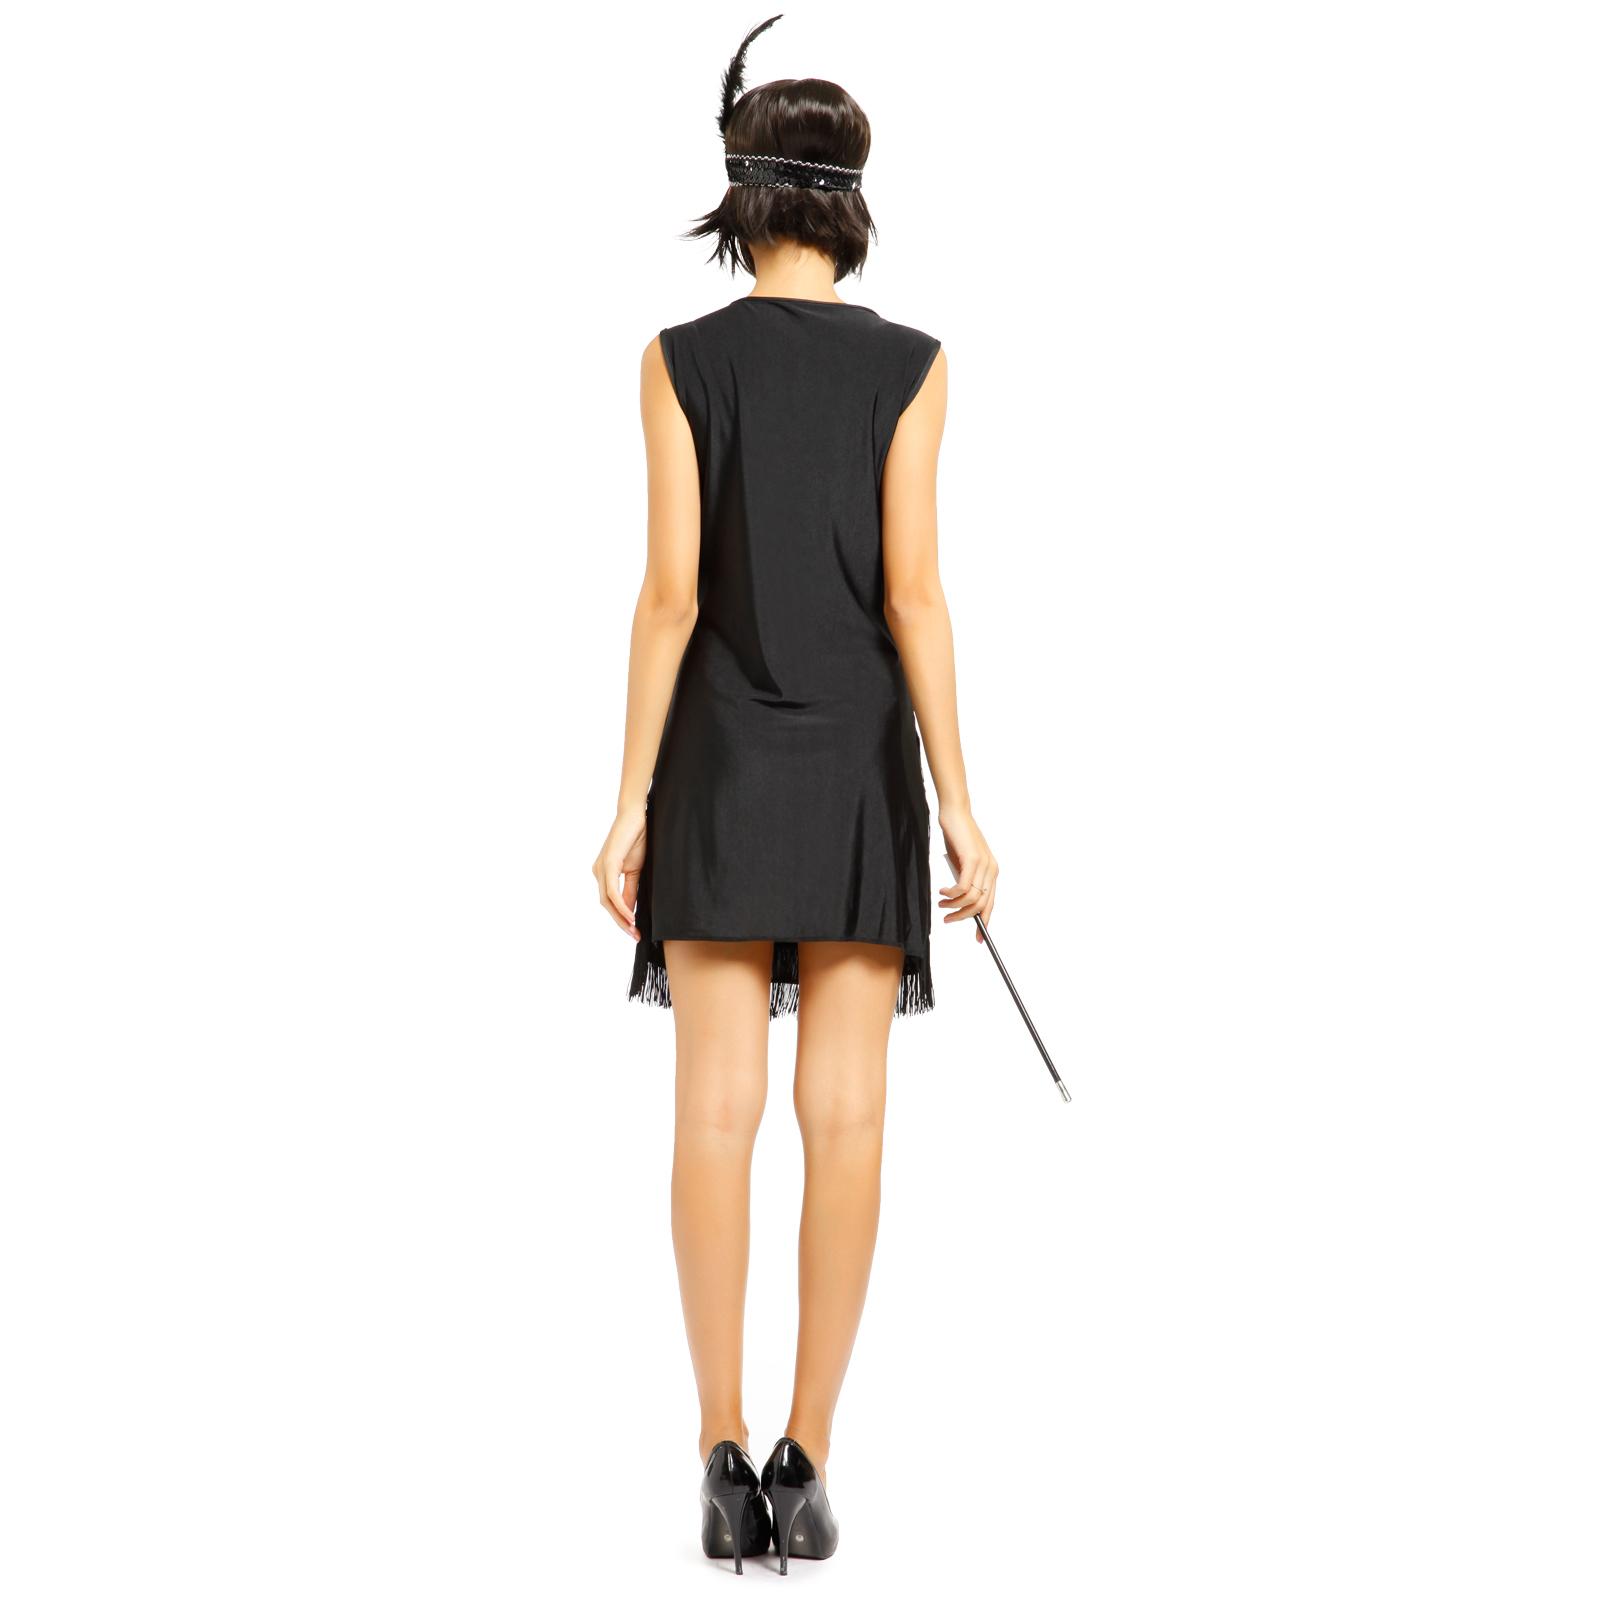 deguisement costume tenue robe a frange bandeau flume. Black Bedroom Furniture Sets. Home Design Ideas